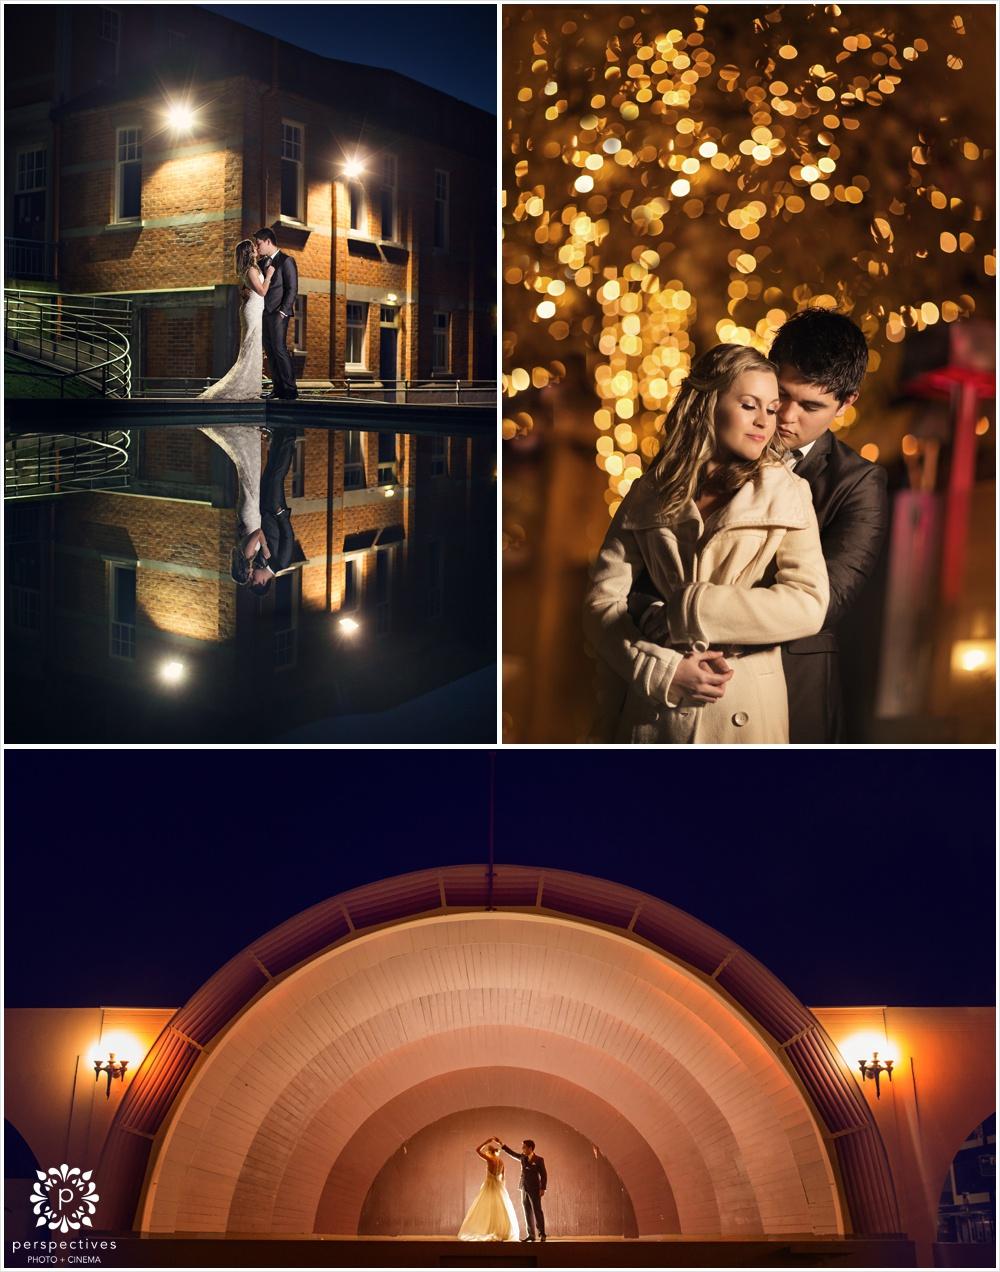 Auckland night wedding photo